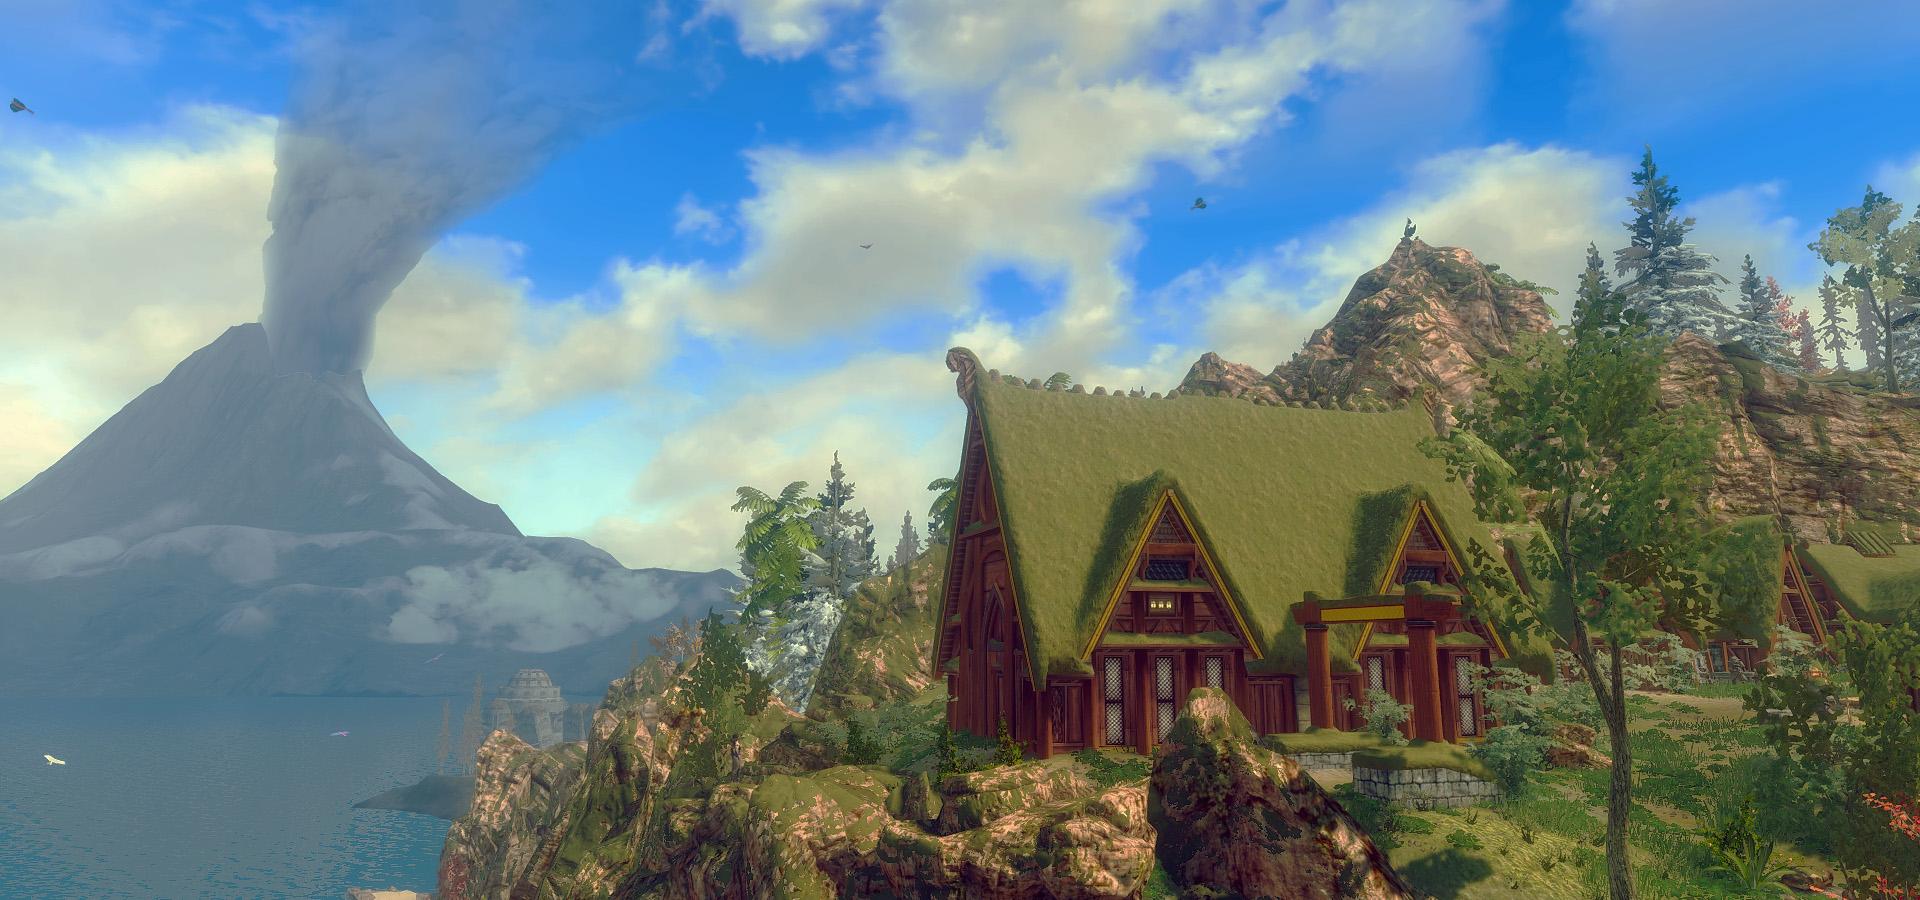 544. Деревня скаалов, Солстейм.jpg - Elder Scrolls 5: Skyrim, the CBBE, Сборка-21